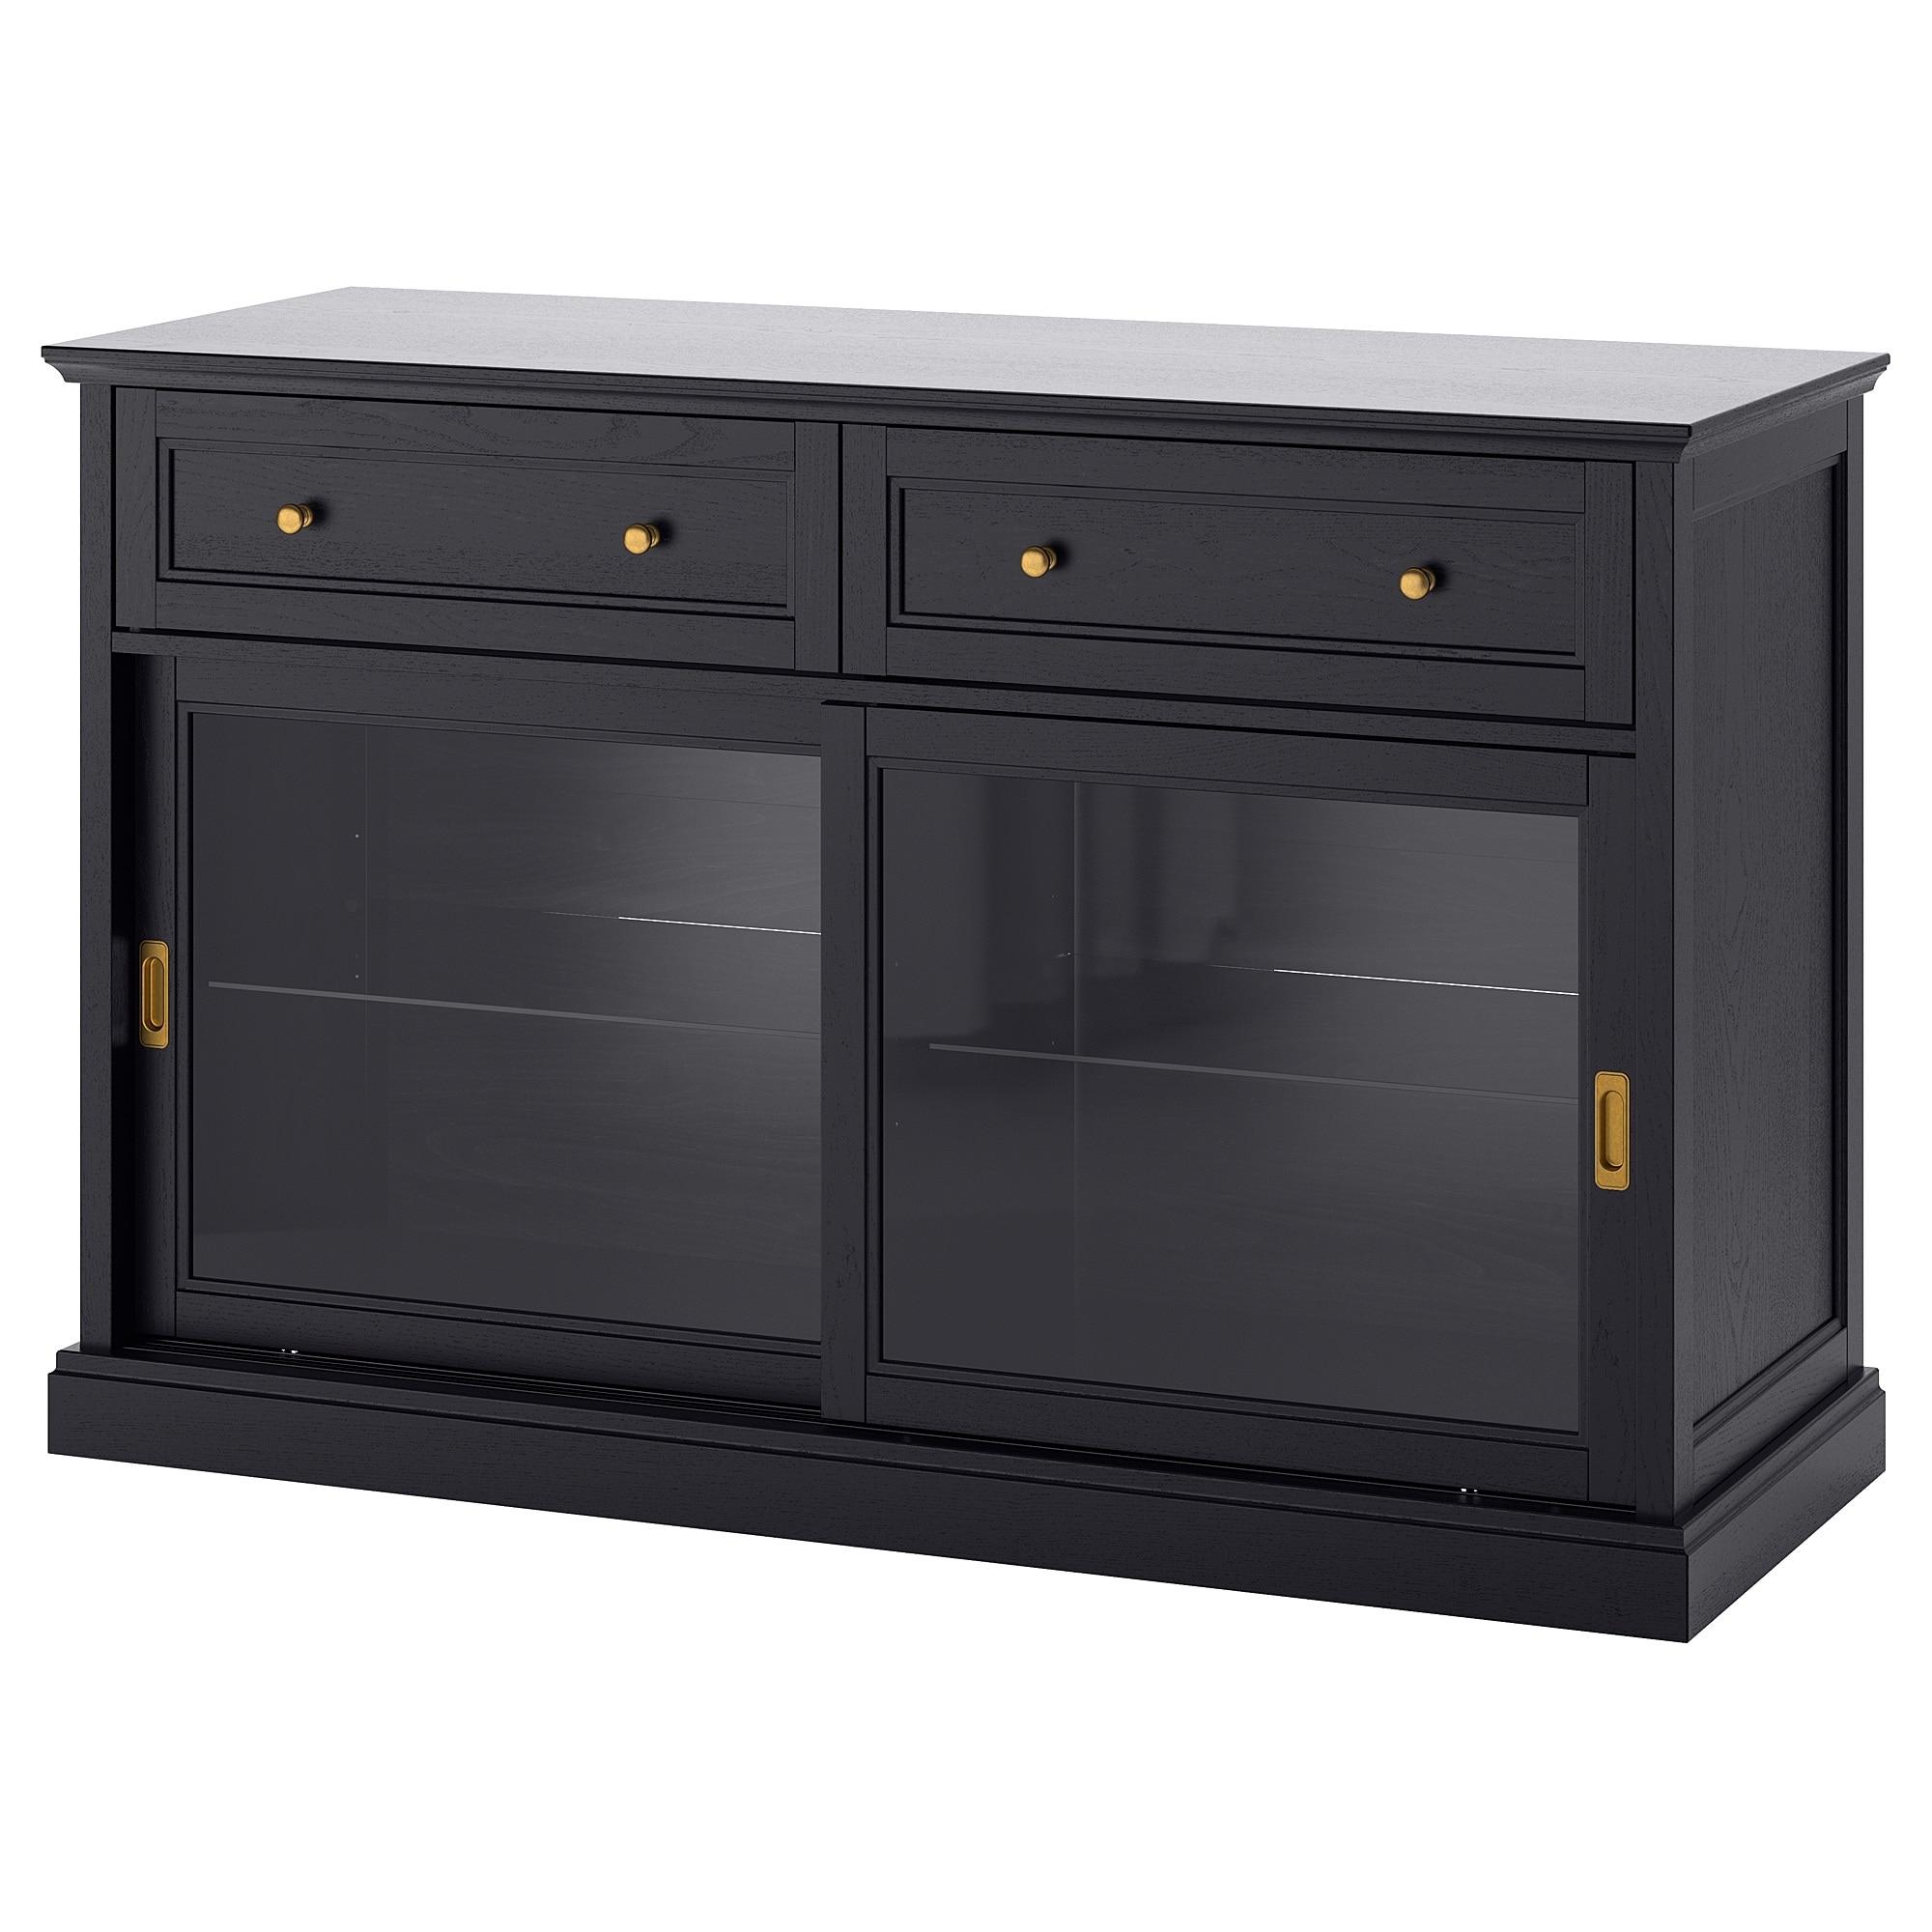 Sideboards & Buffet Cabinets | Ikea With Regard To Recent Brown Chevron 4 Door Sideboards (#19 of 20)